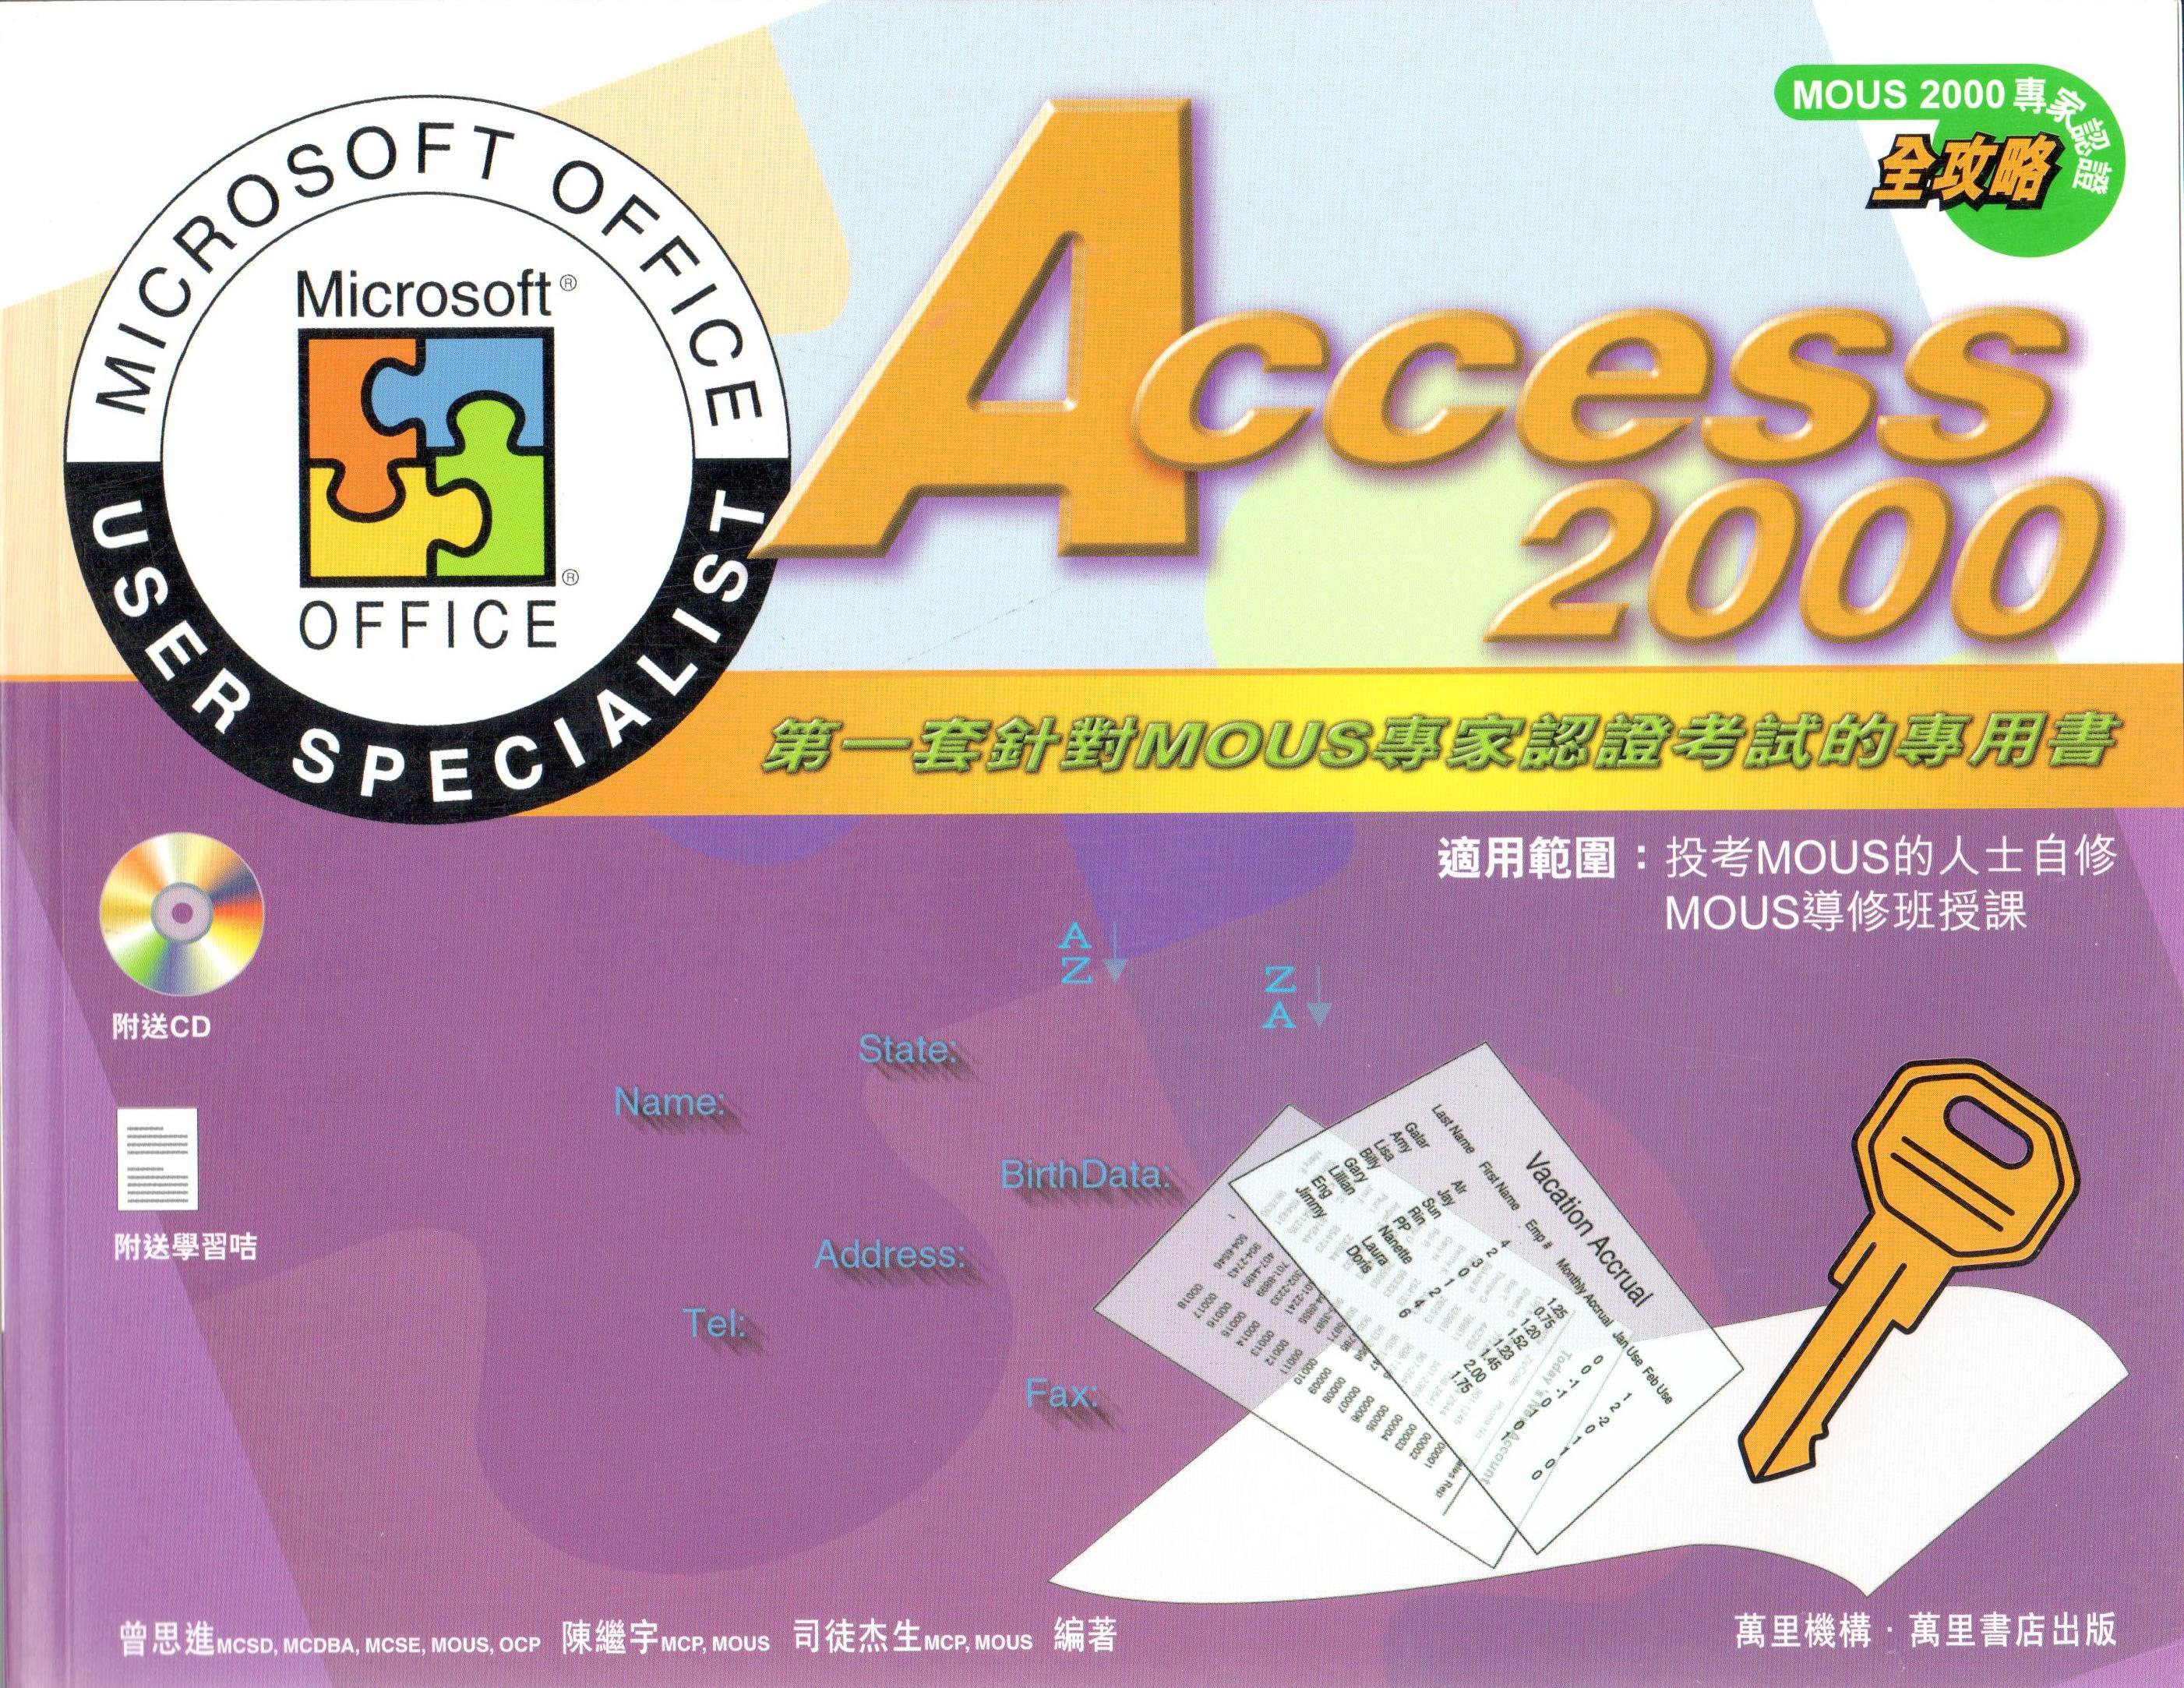 Access 2000 微软办公室专家认证全攻略